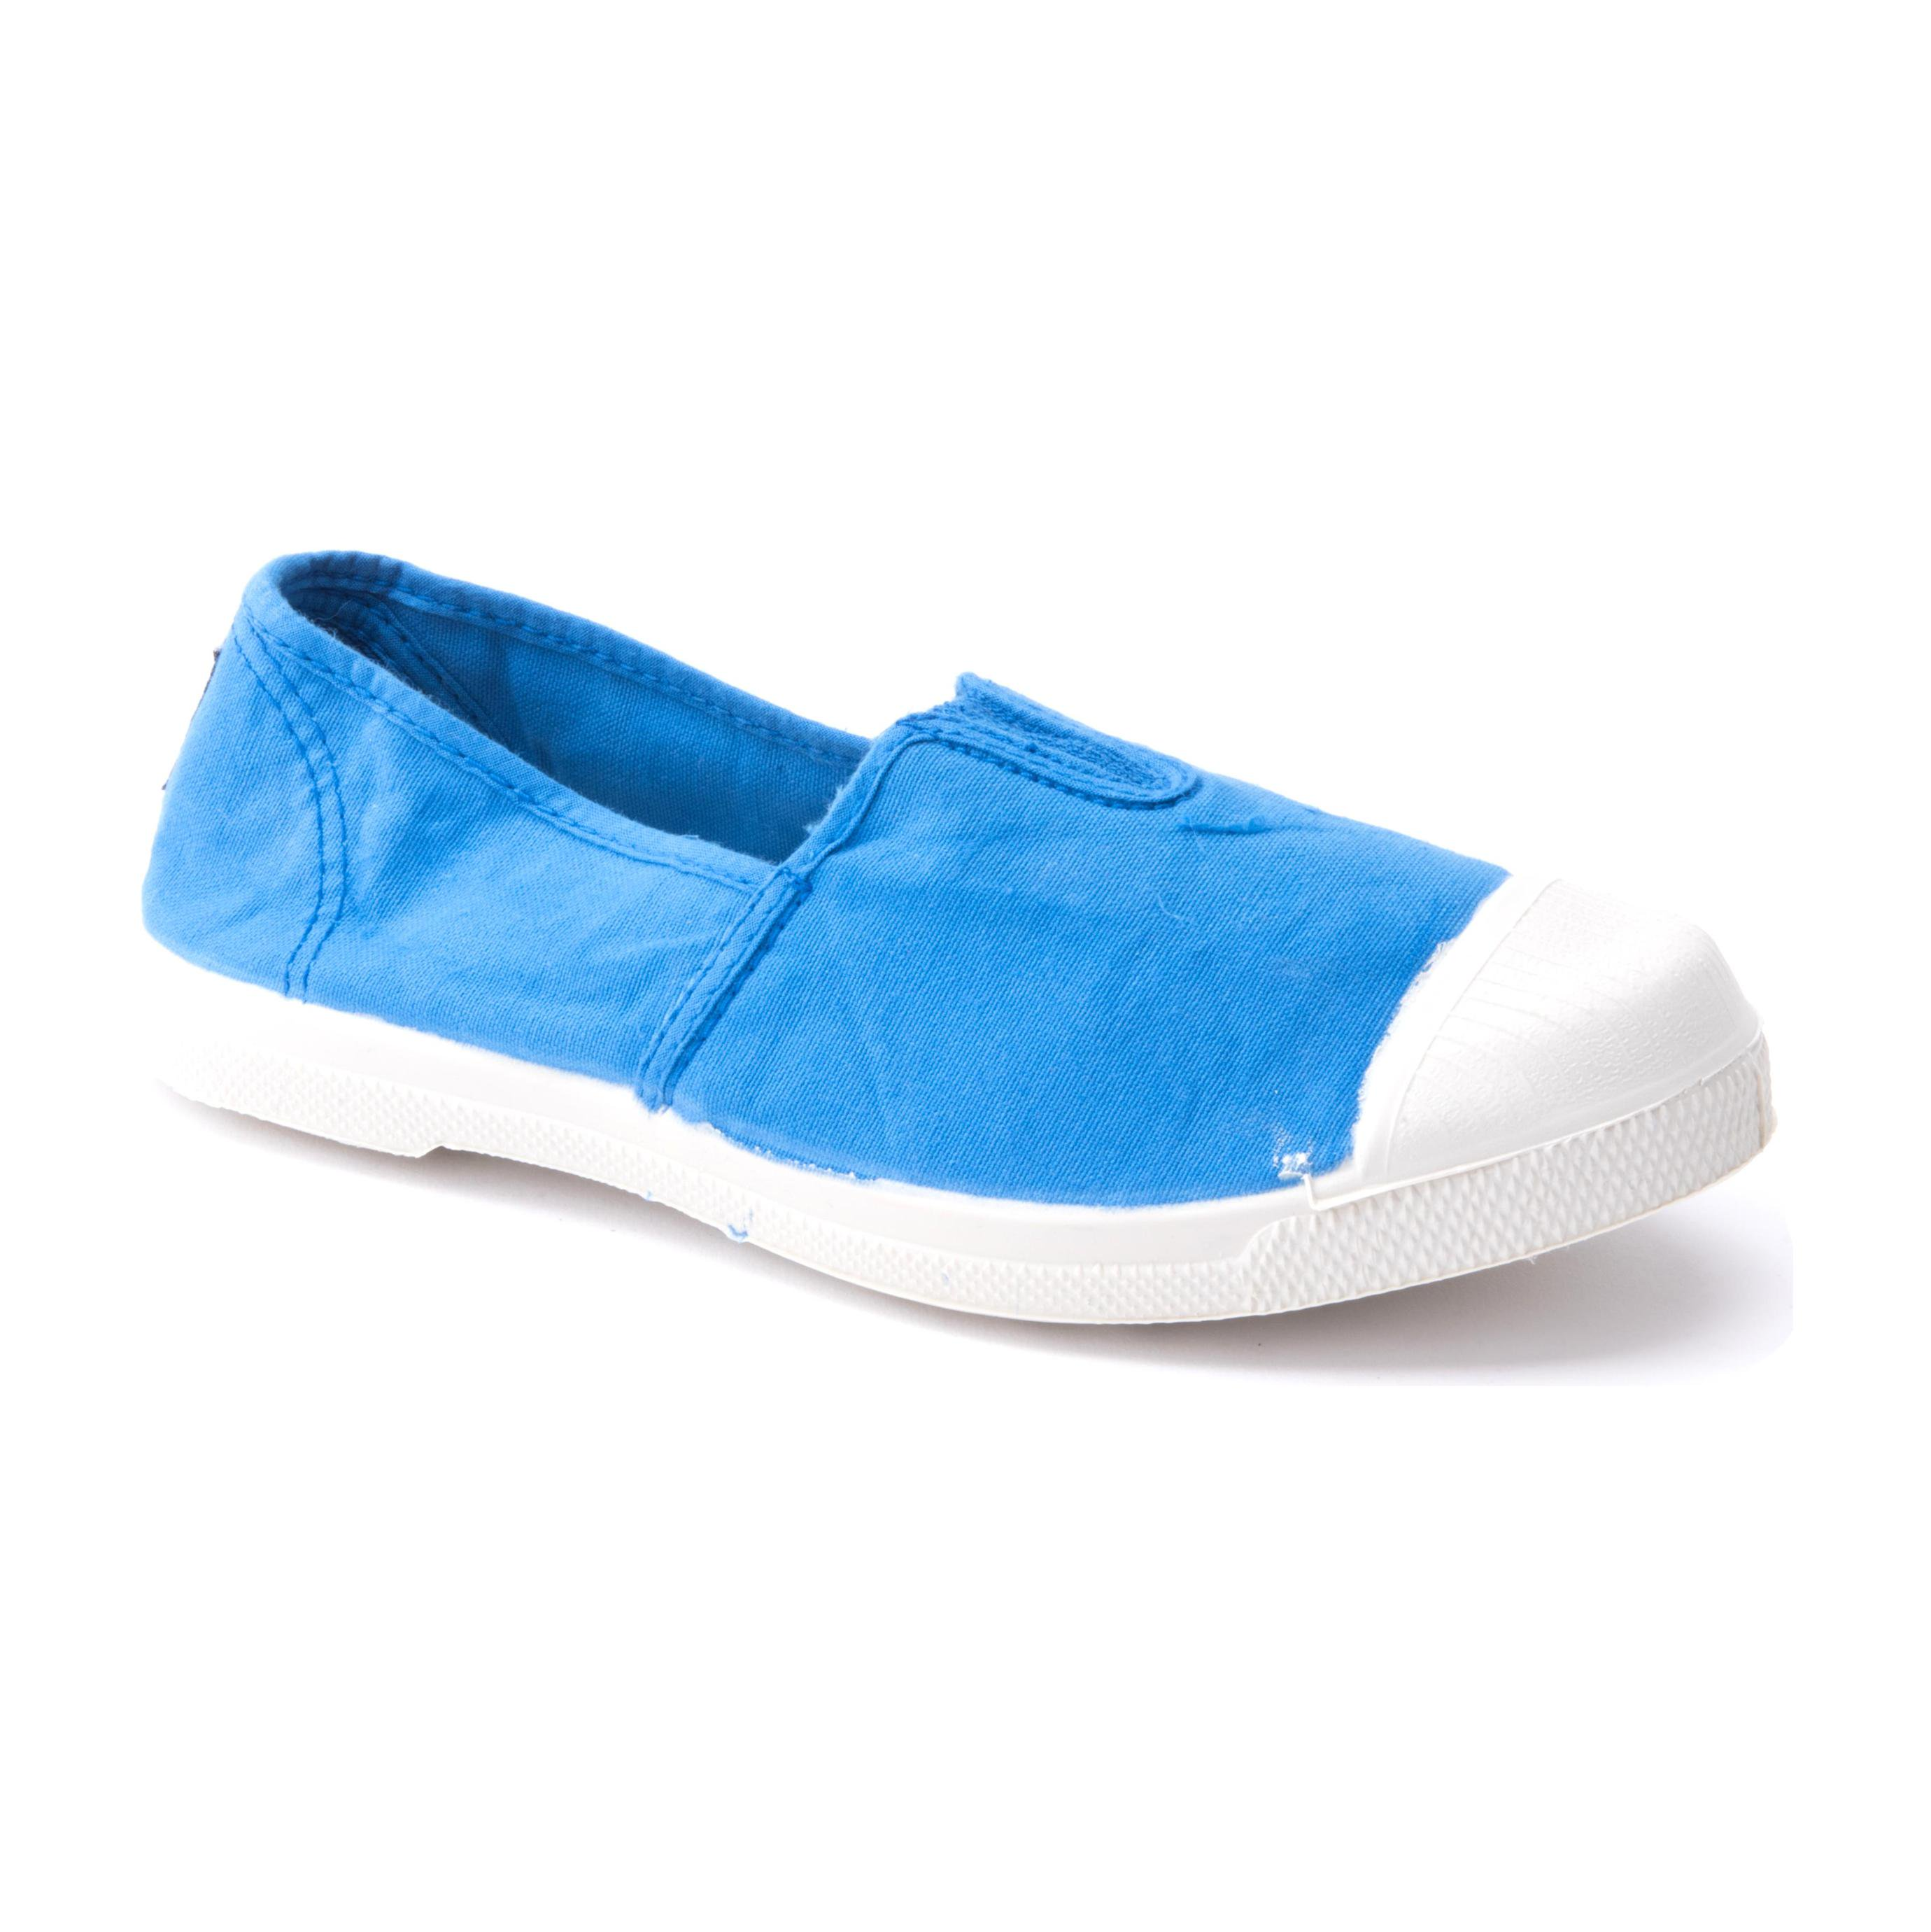 Natural World 106 - נעלי סניקרס ספורטיביות בצבע כחול רויאל